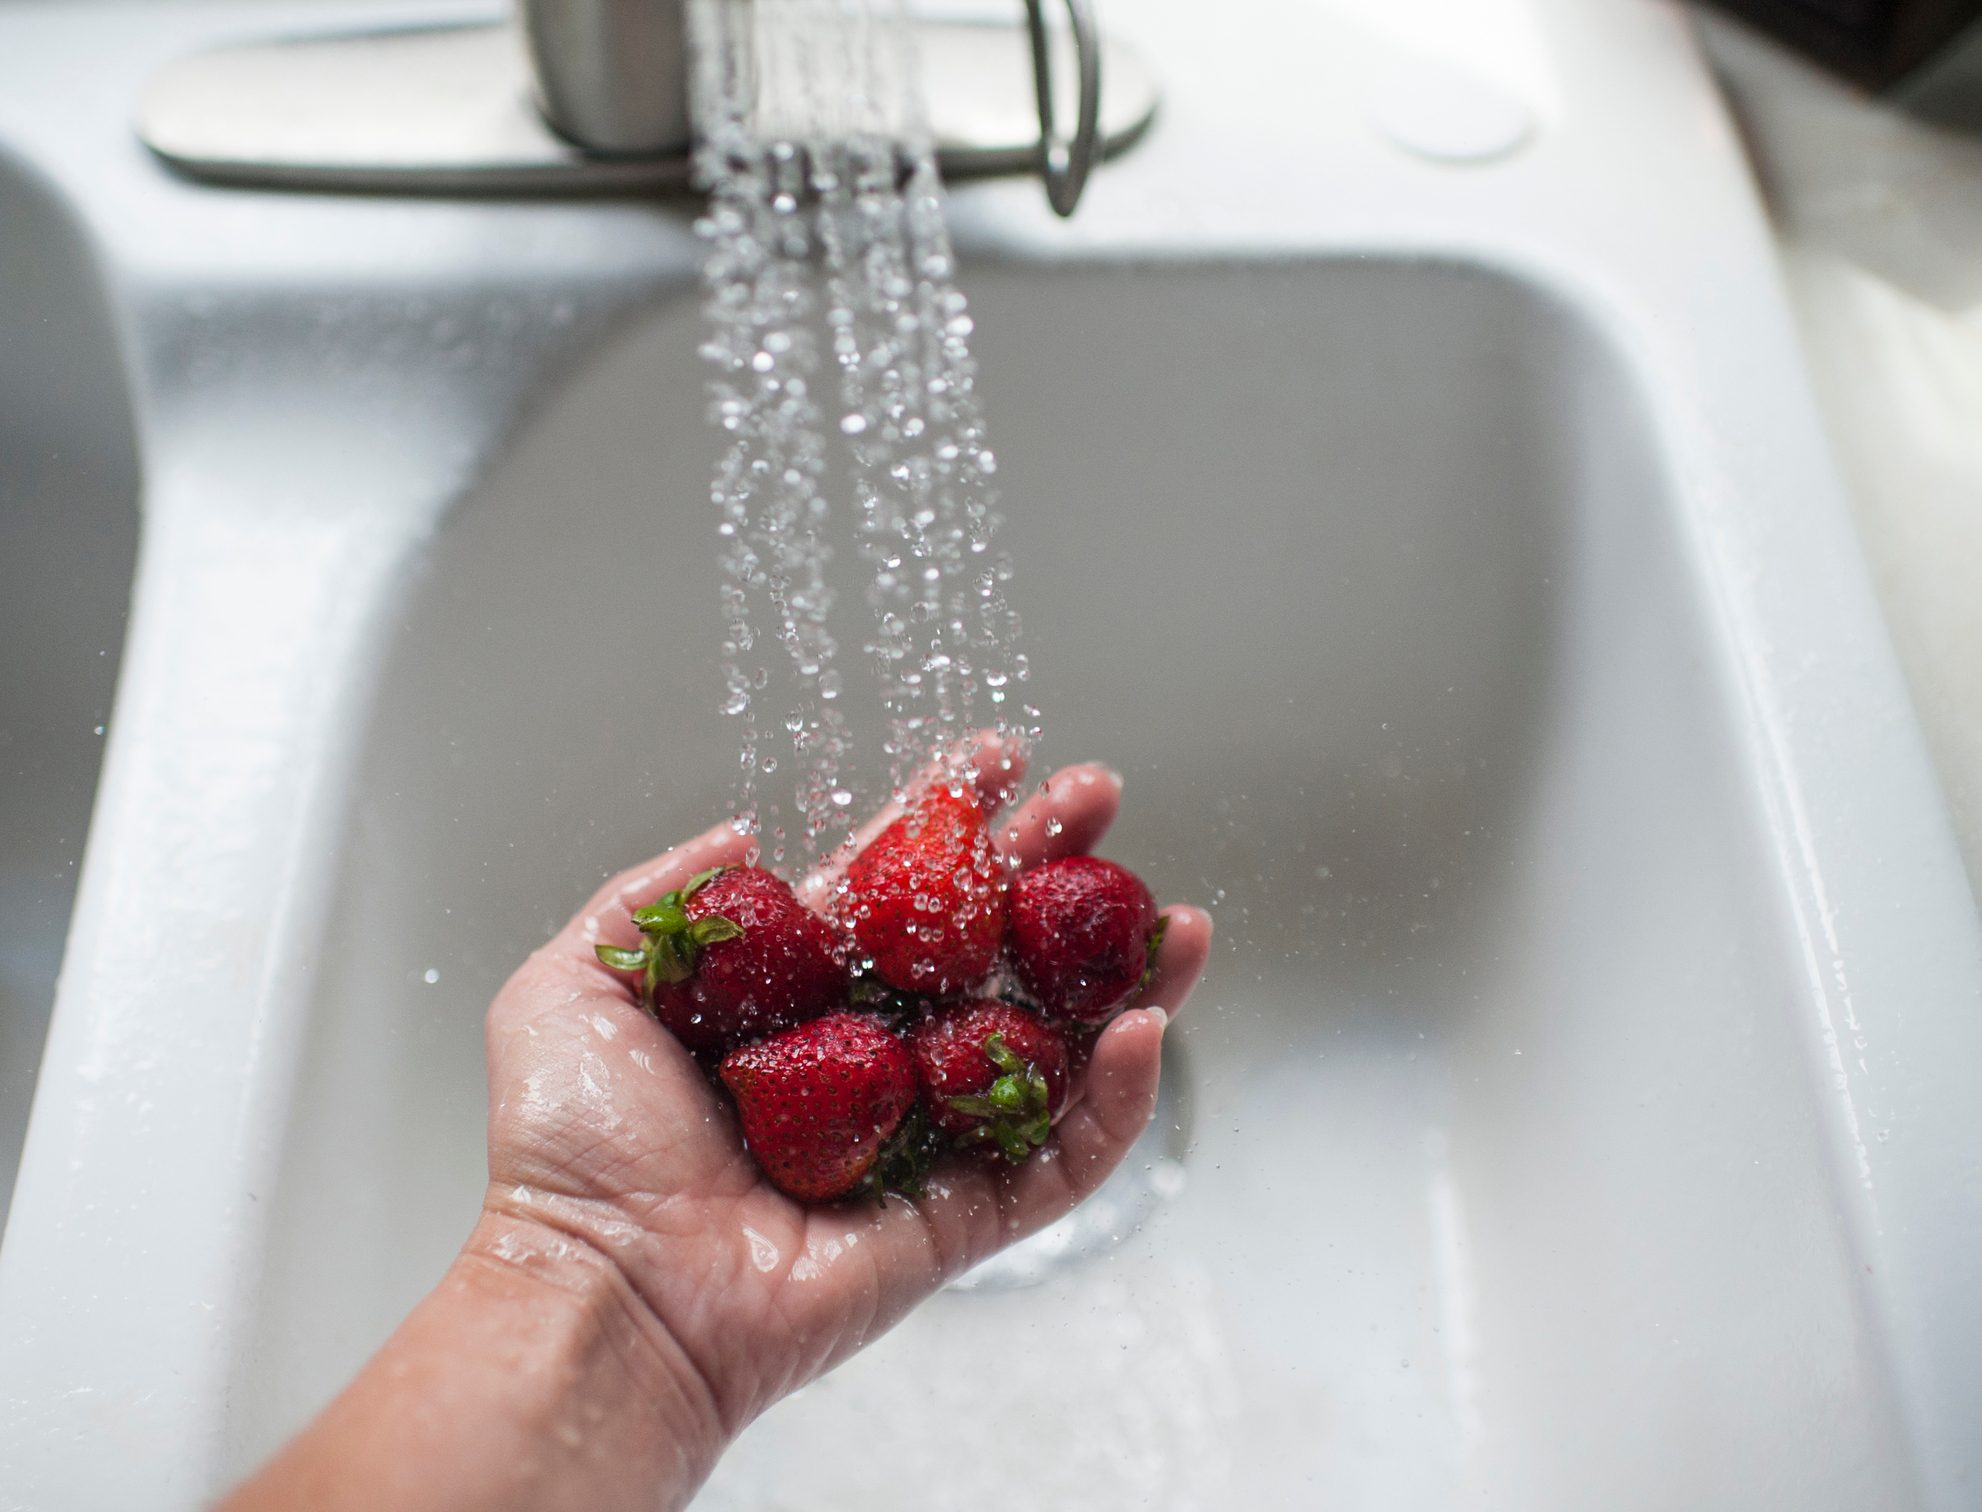 washing strawberries in sink